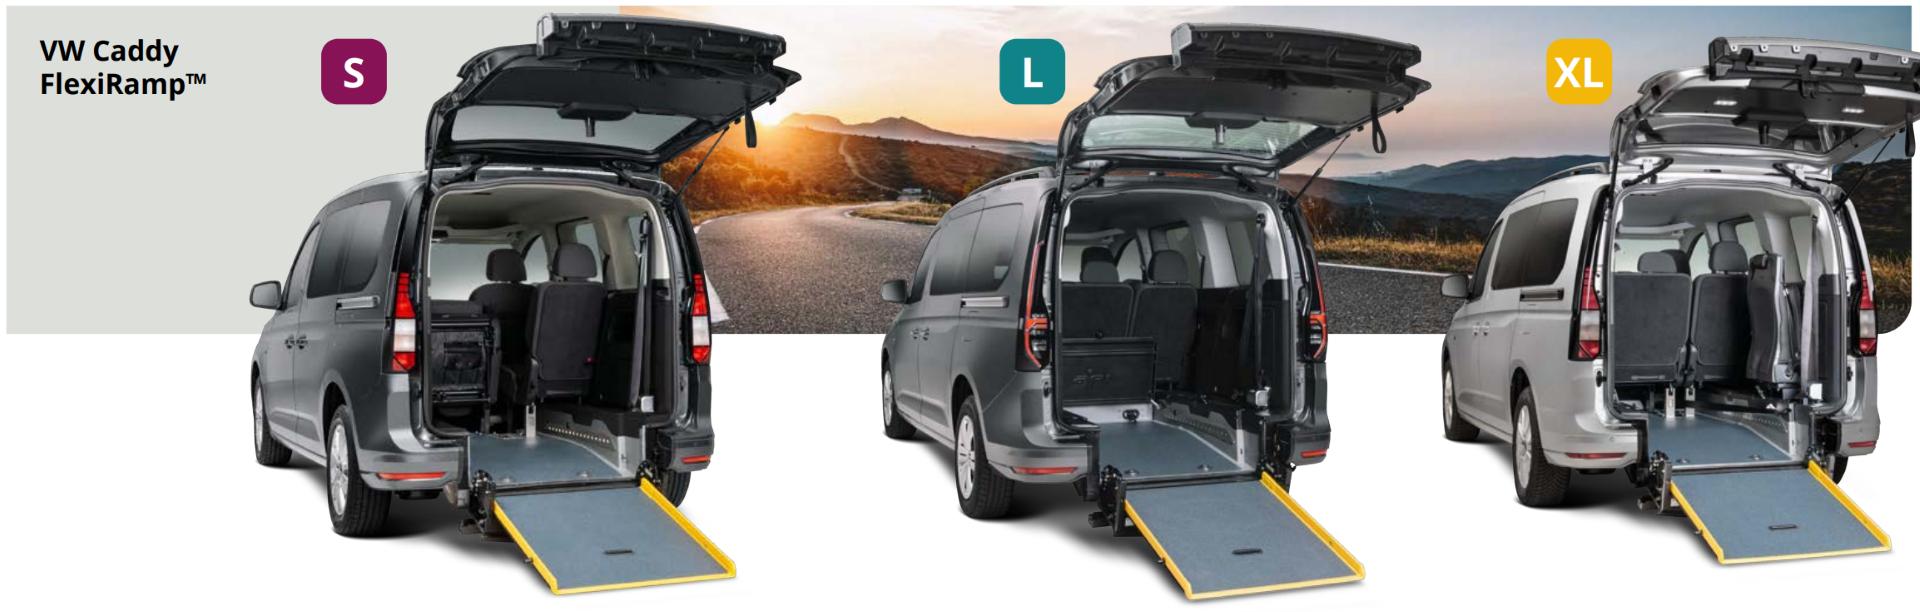 VW Caddy FlexiRamp™